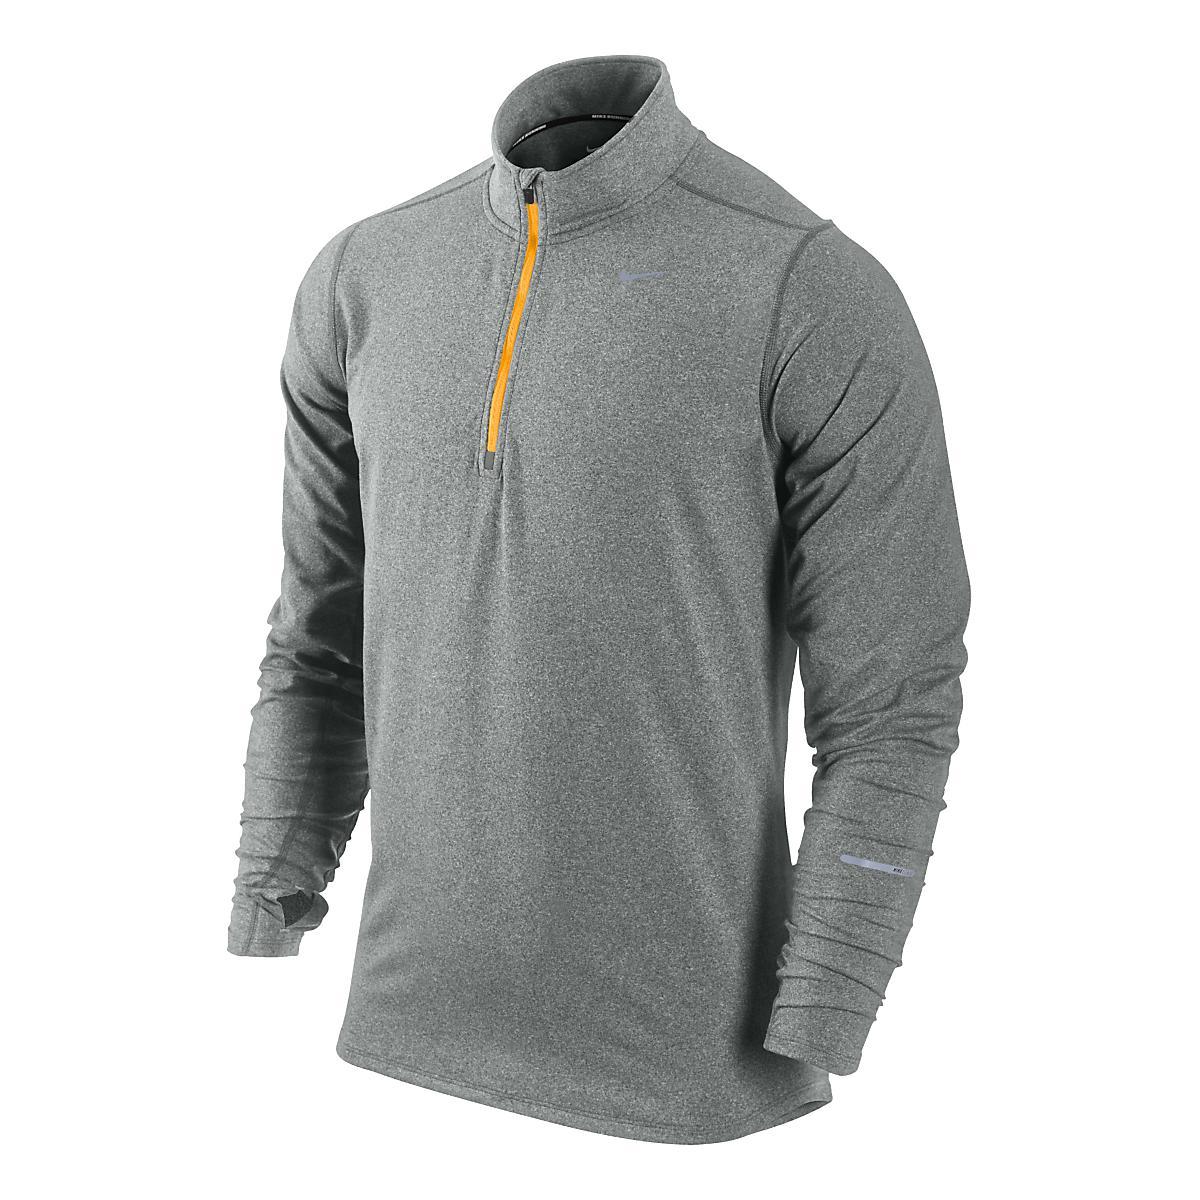 c7fe606c9dd0 Mens Nike Element Long Sleeve 1 2 Zip Technical Tops at Road Runner Sports